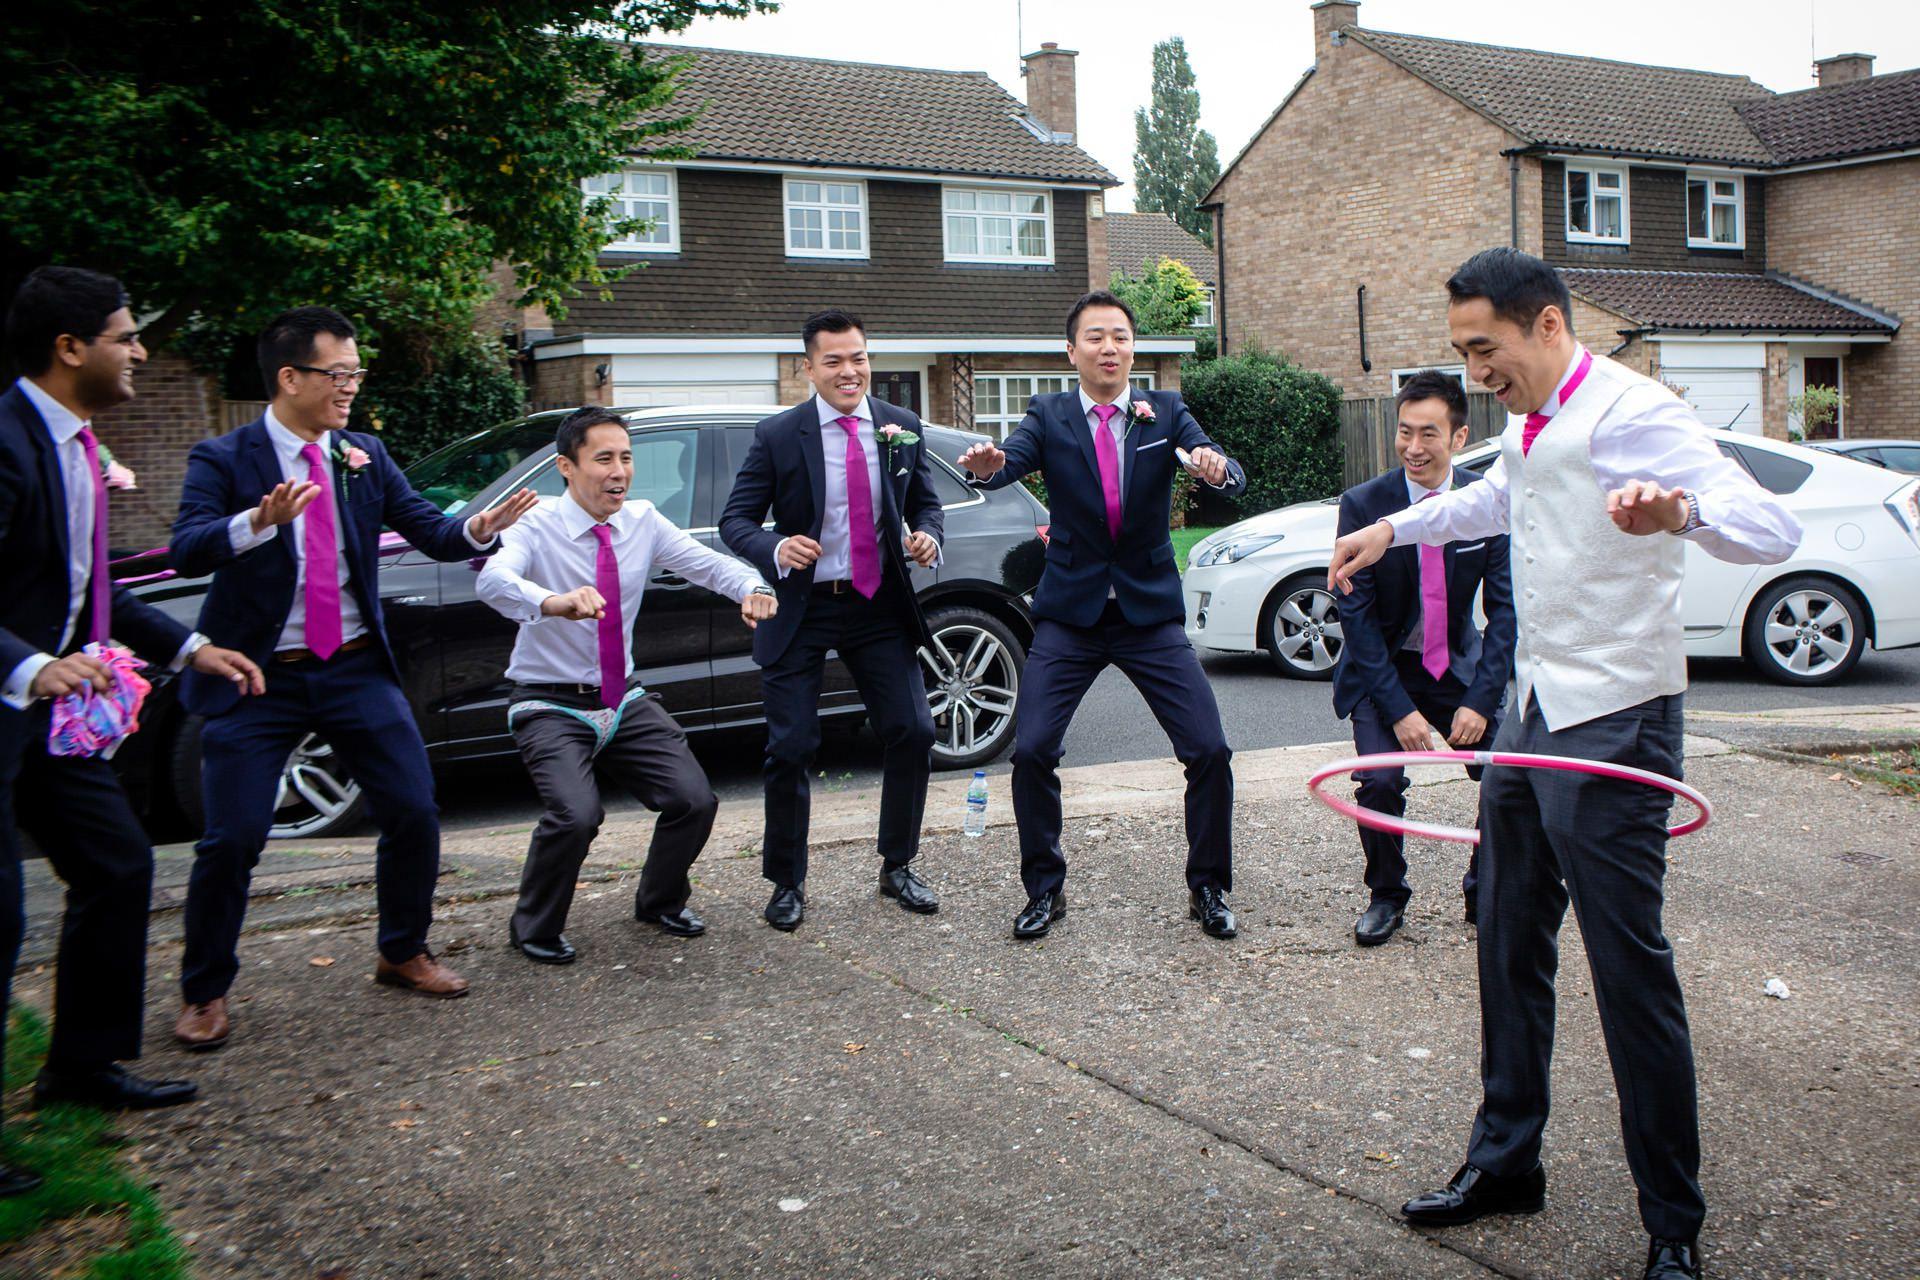 Chinese Wedding photo of groom and groomsmen games